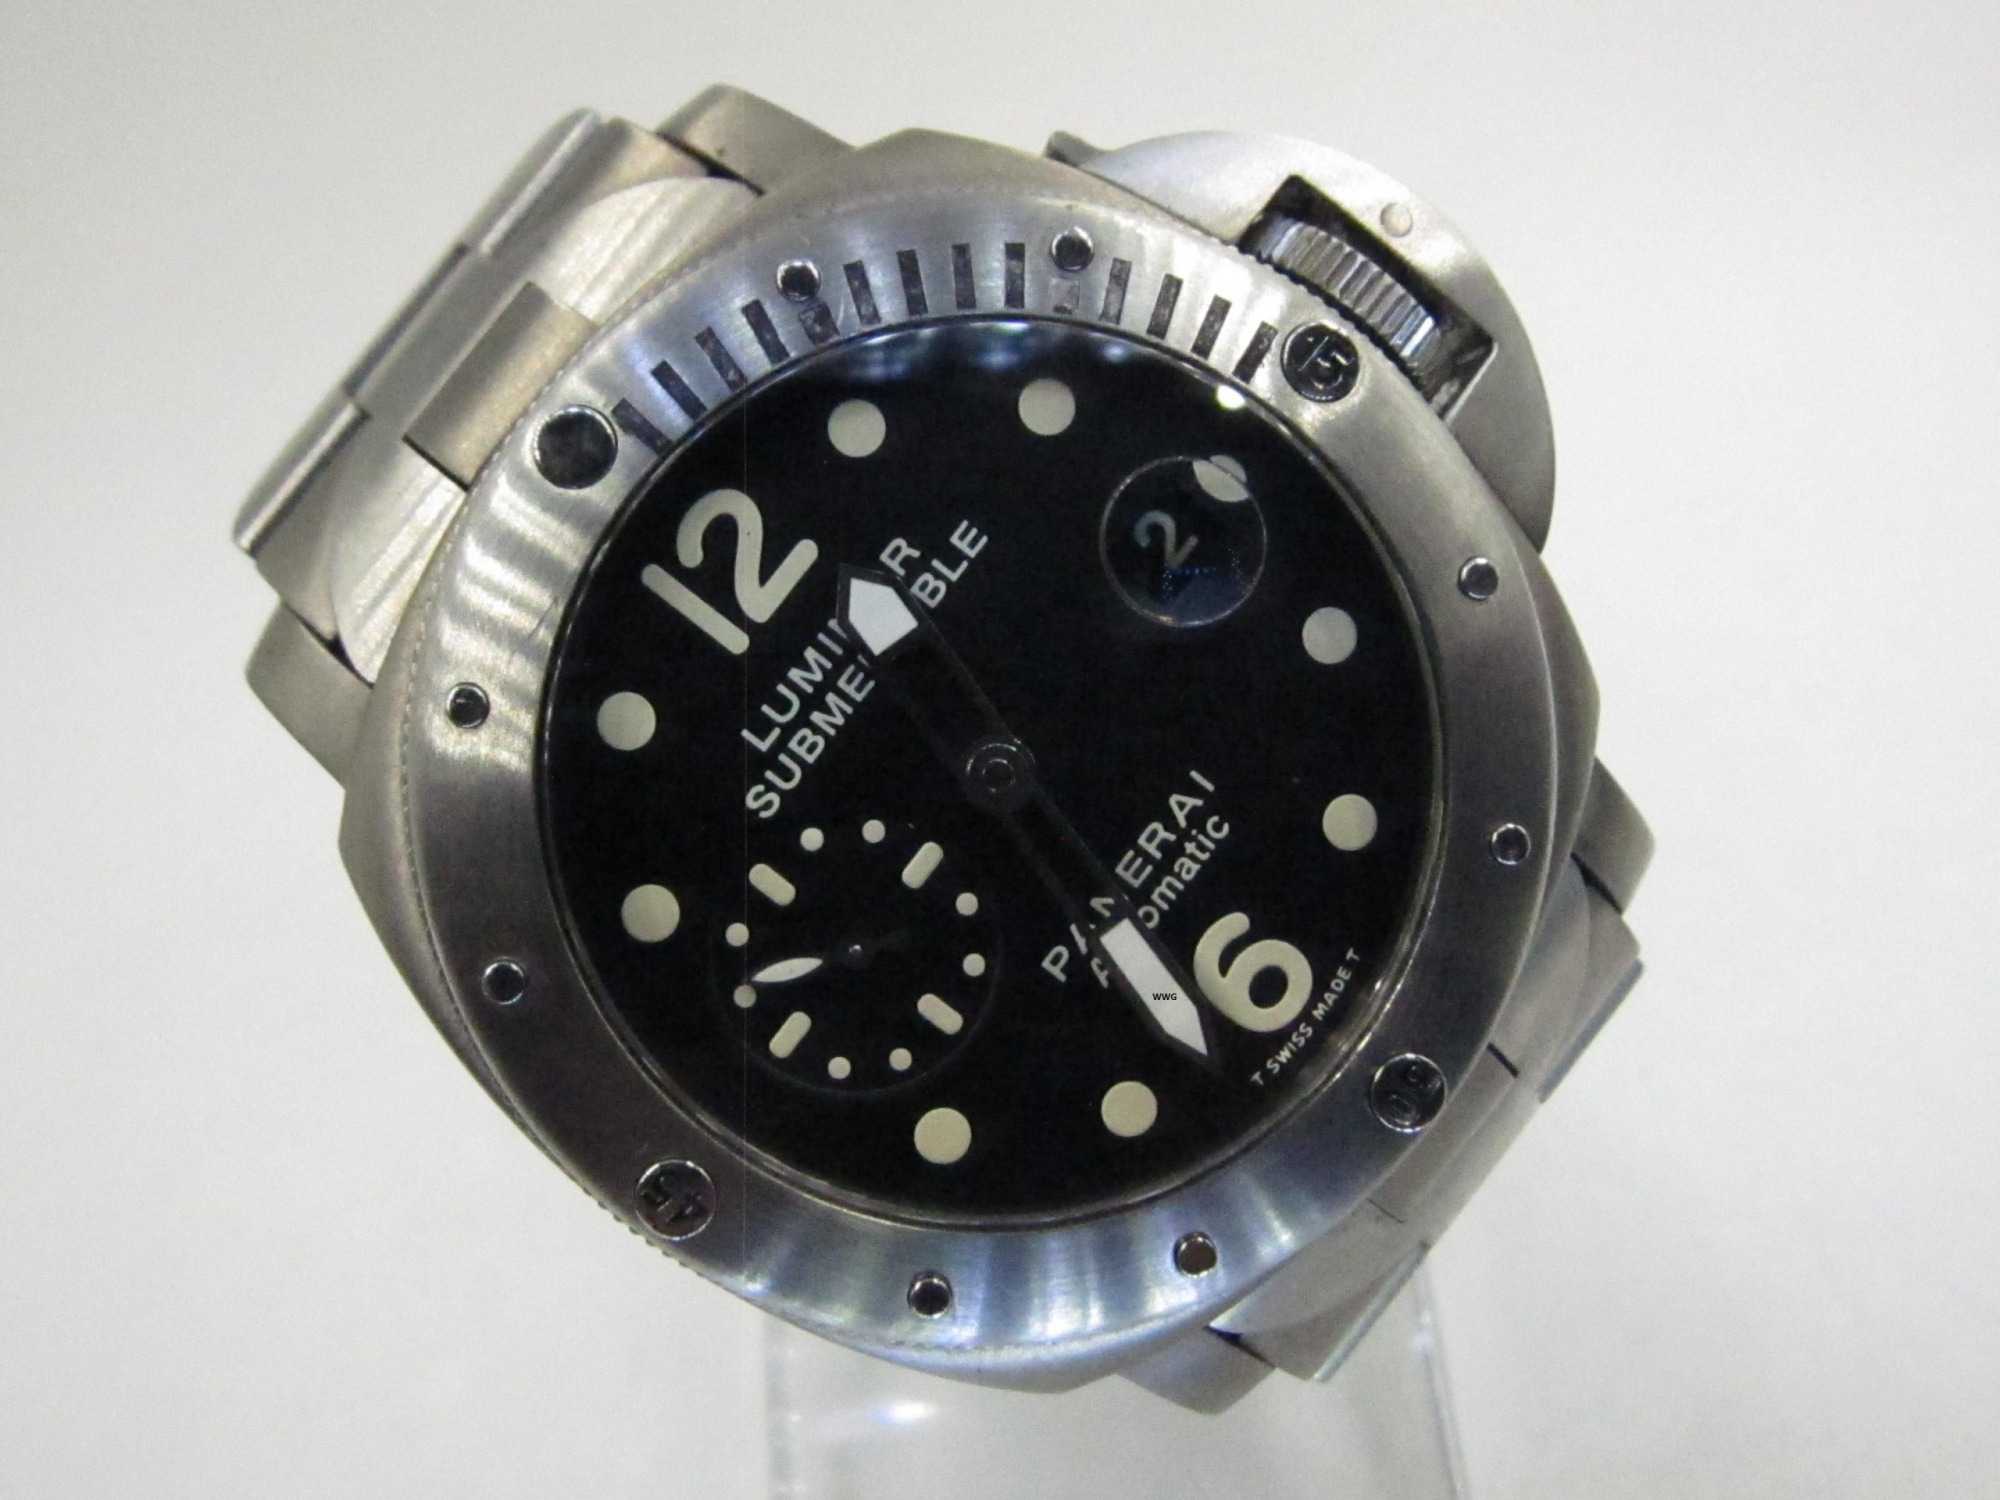 Panerai Luminor Submersible PAM 106(Pre Owned Panerai Watch)PNR-070